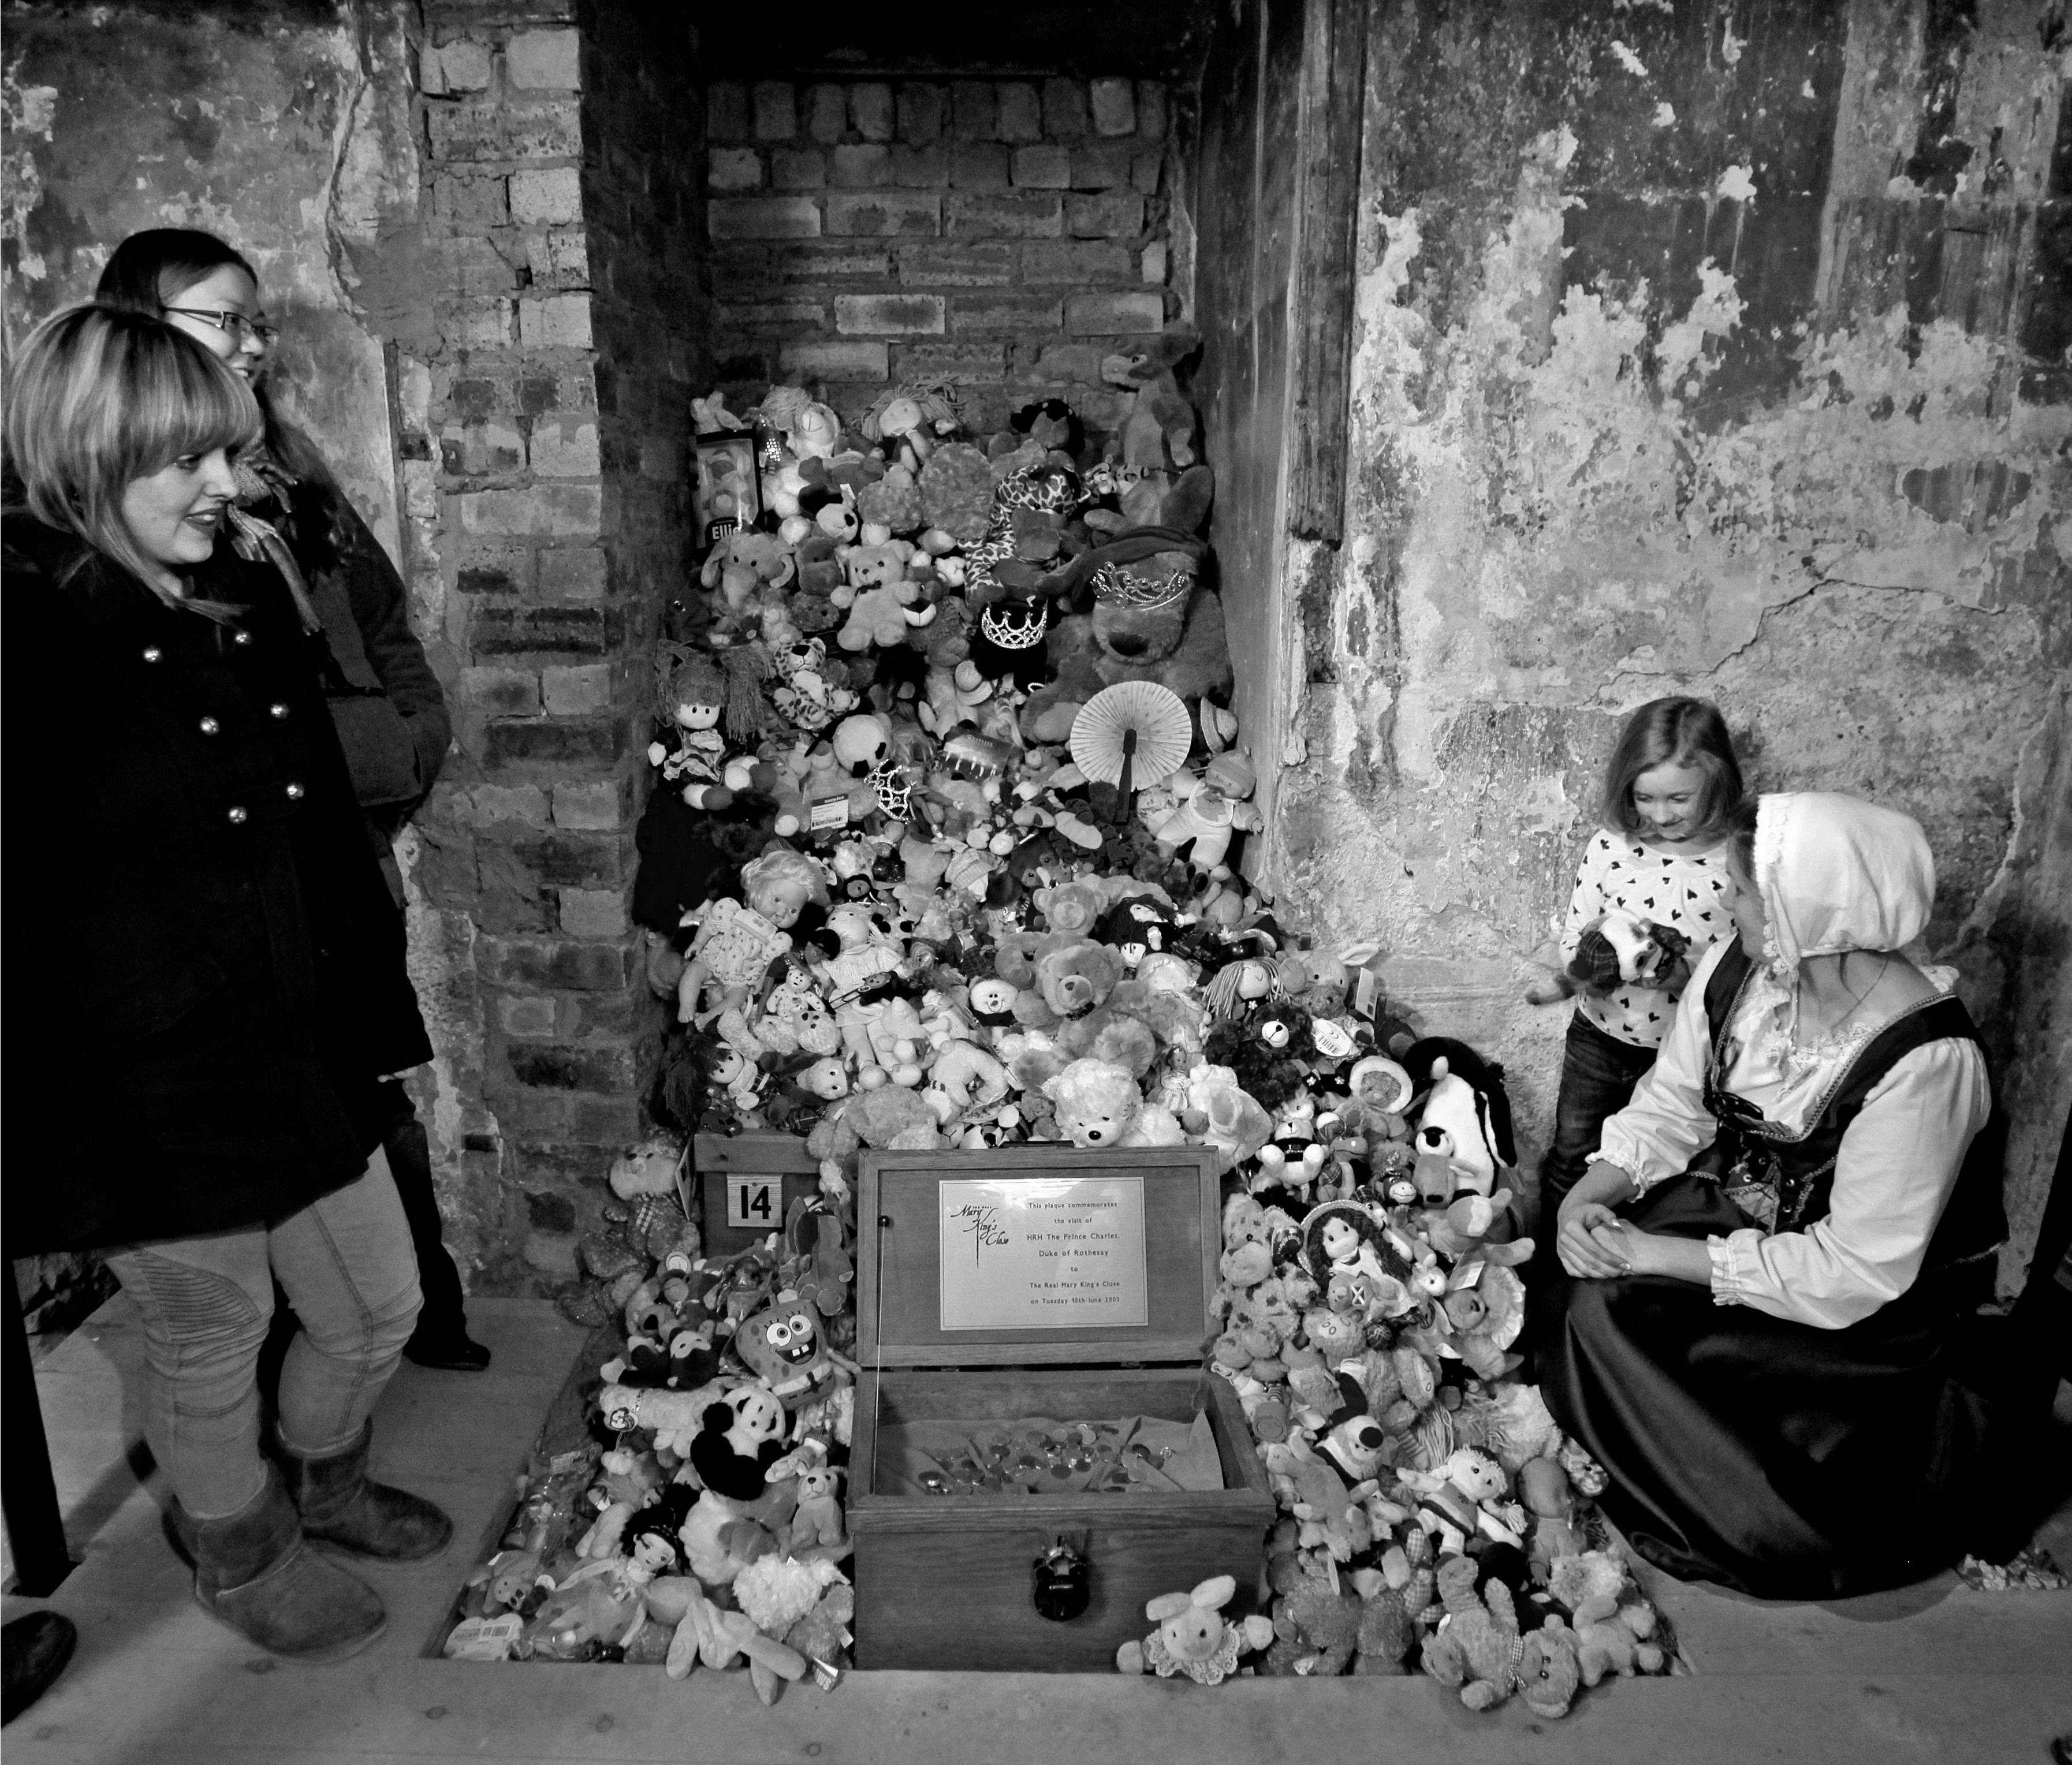 Edinburgh S Hidden History The Story Of Annie S Doll